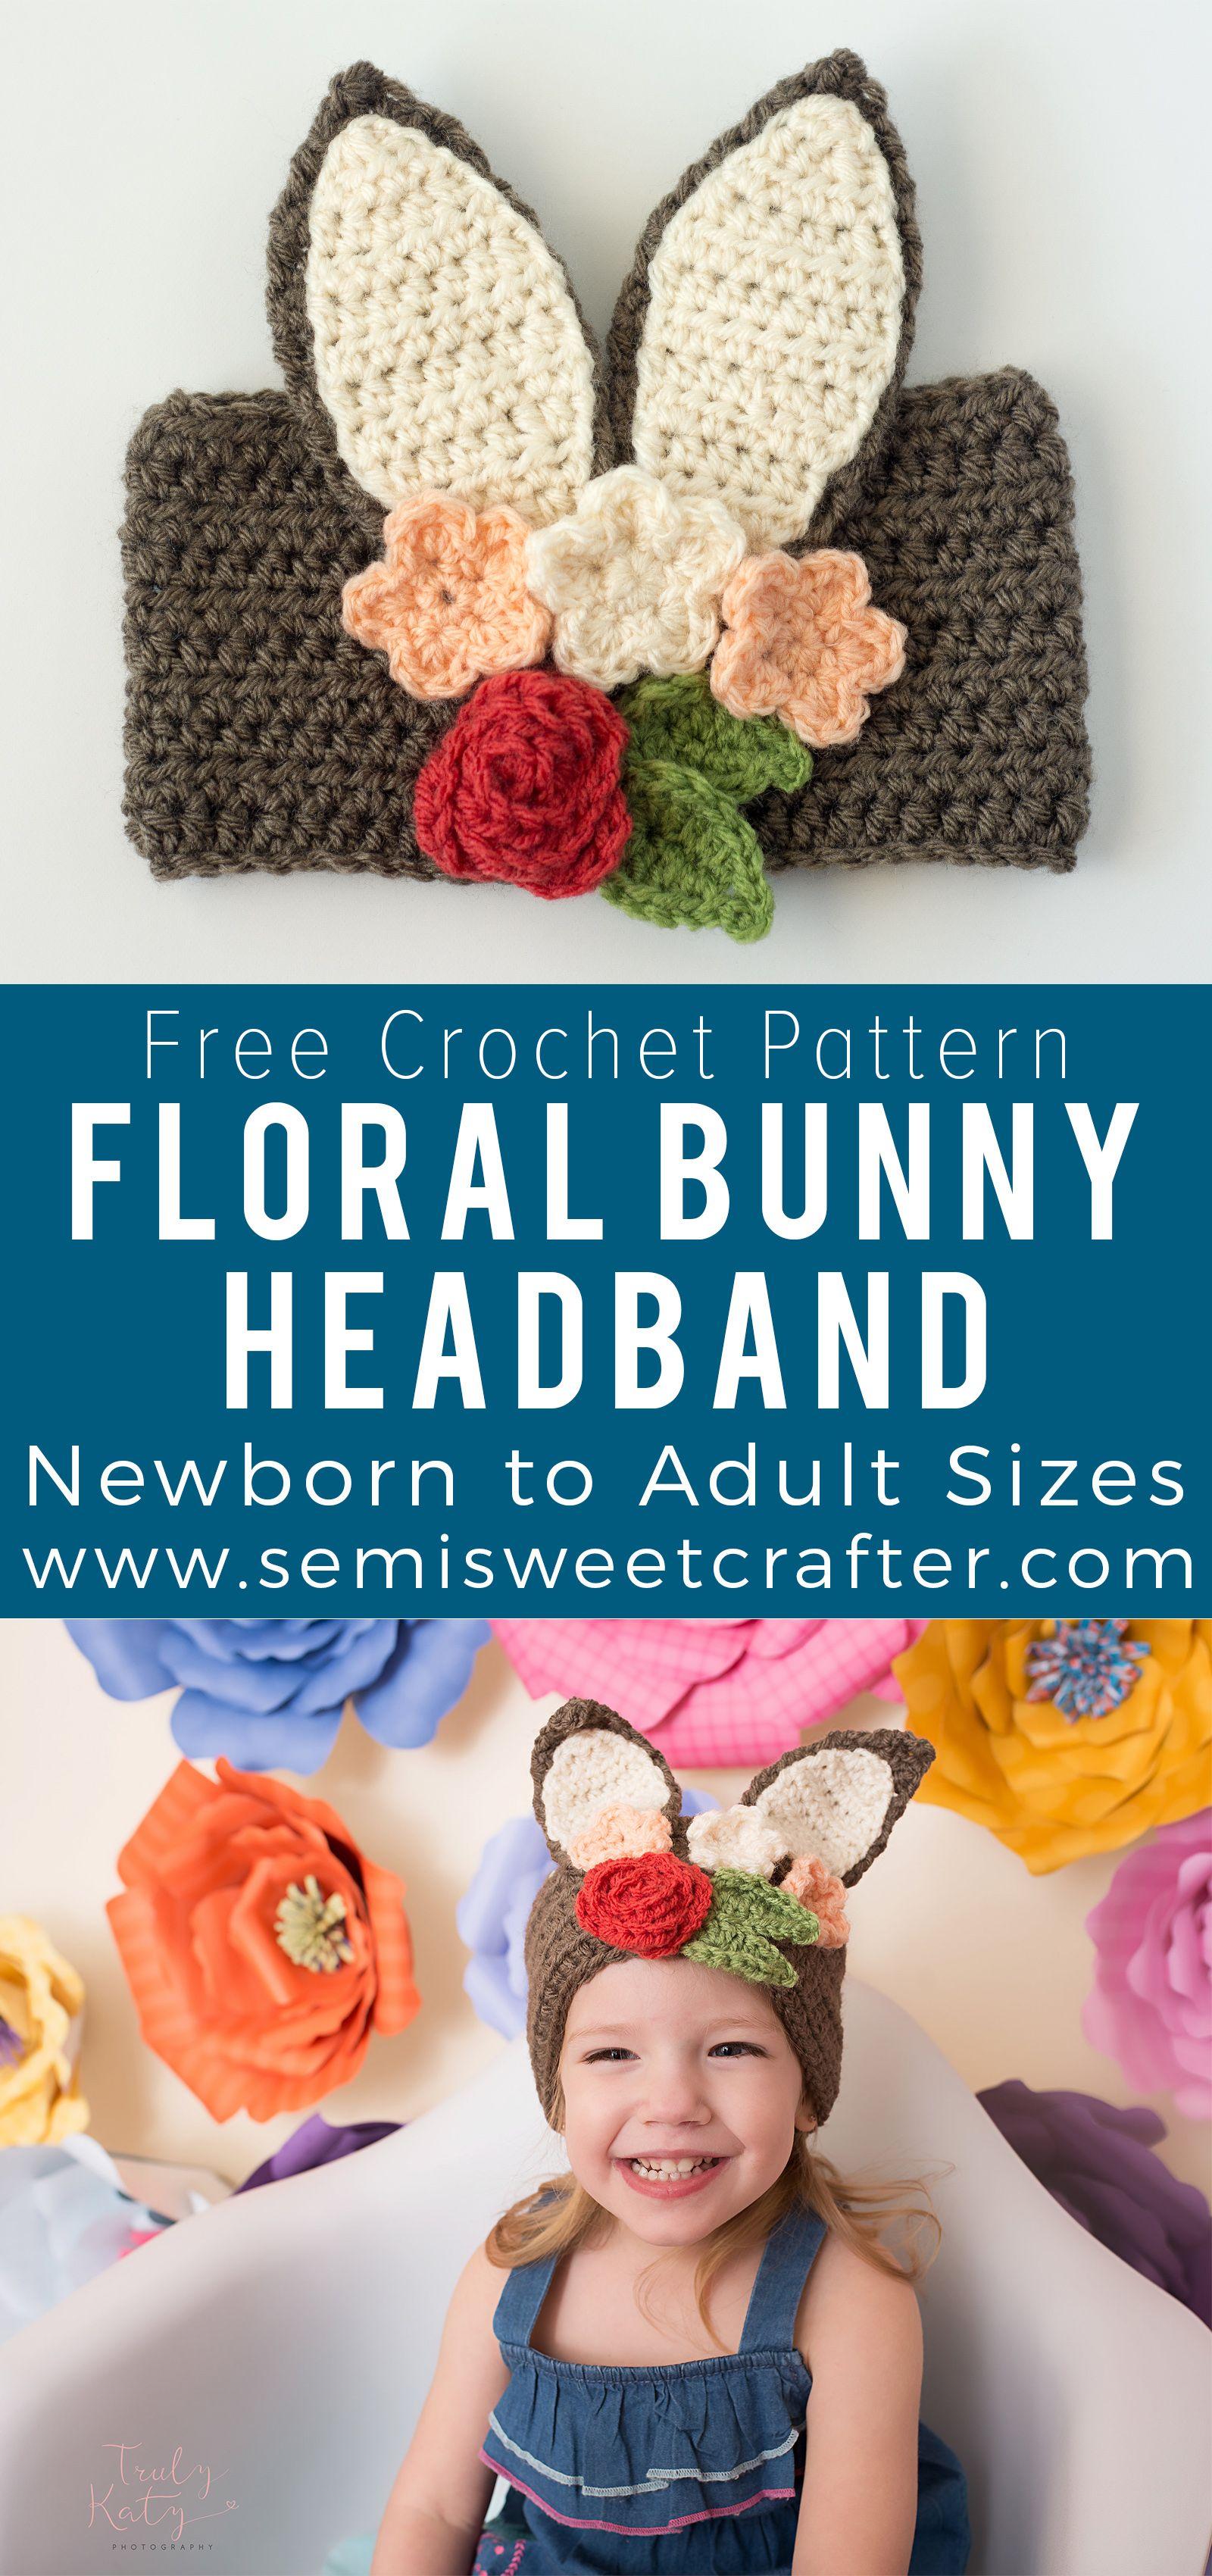 Floral Bunny Headband #crochetedheadbands